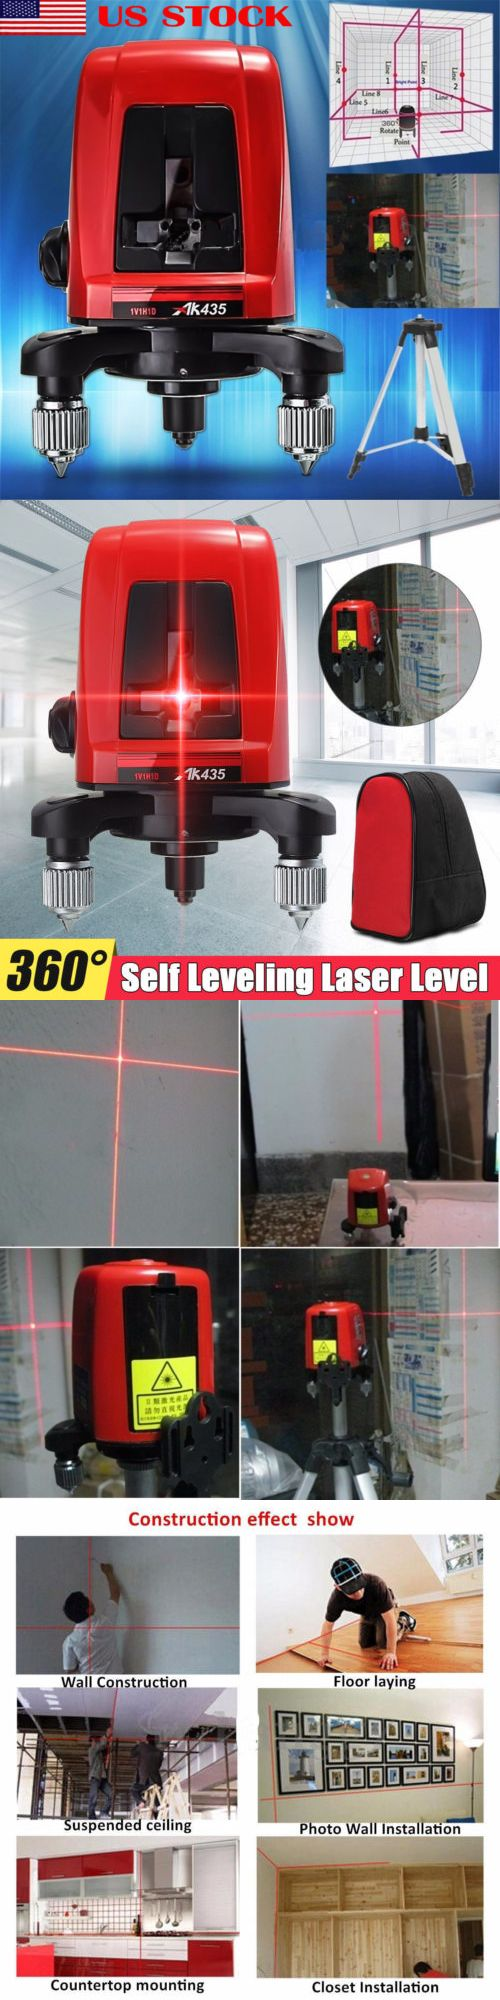 Laser Measuring Tools 126396 Ak435 360 Degree Self Leveling Cross Laser Level 2 Line 1 Point Package Bag Usa Buy It Now Only 2 Laser Levels Usa Bag Laser